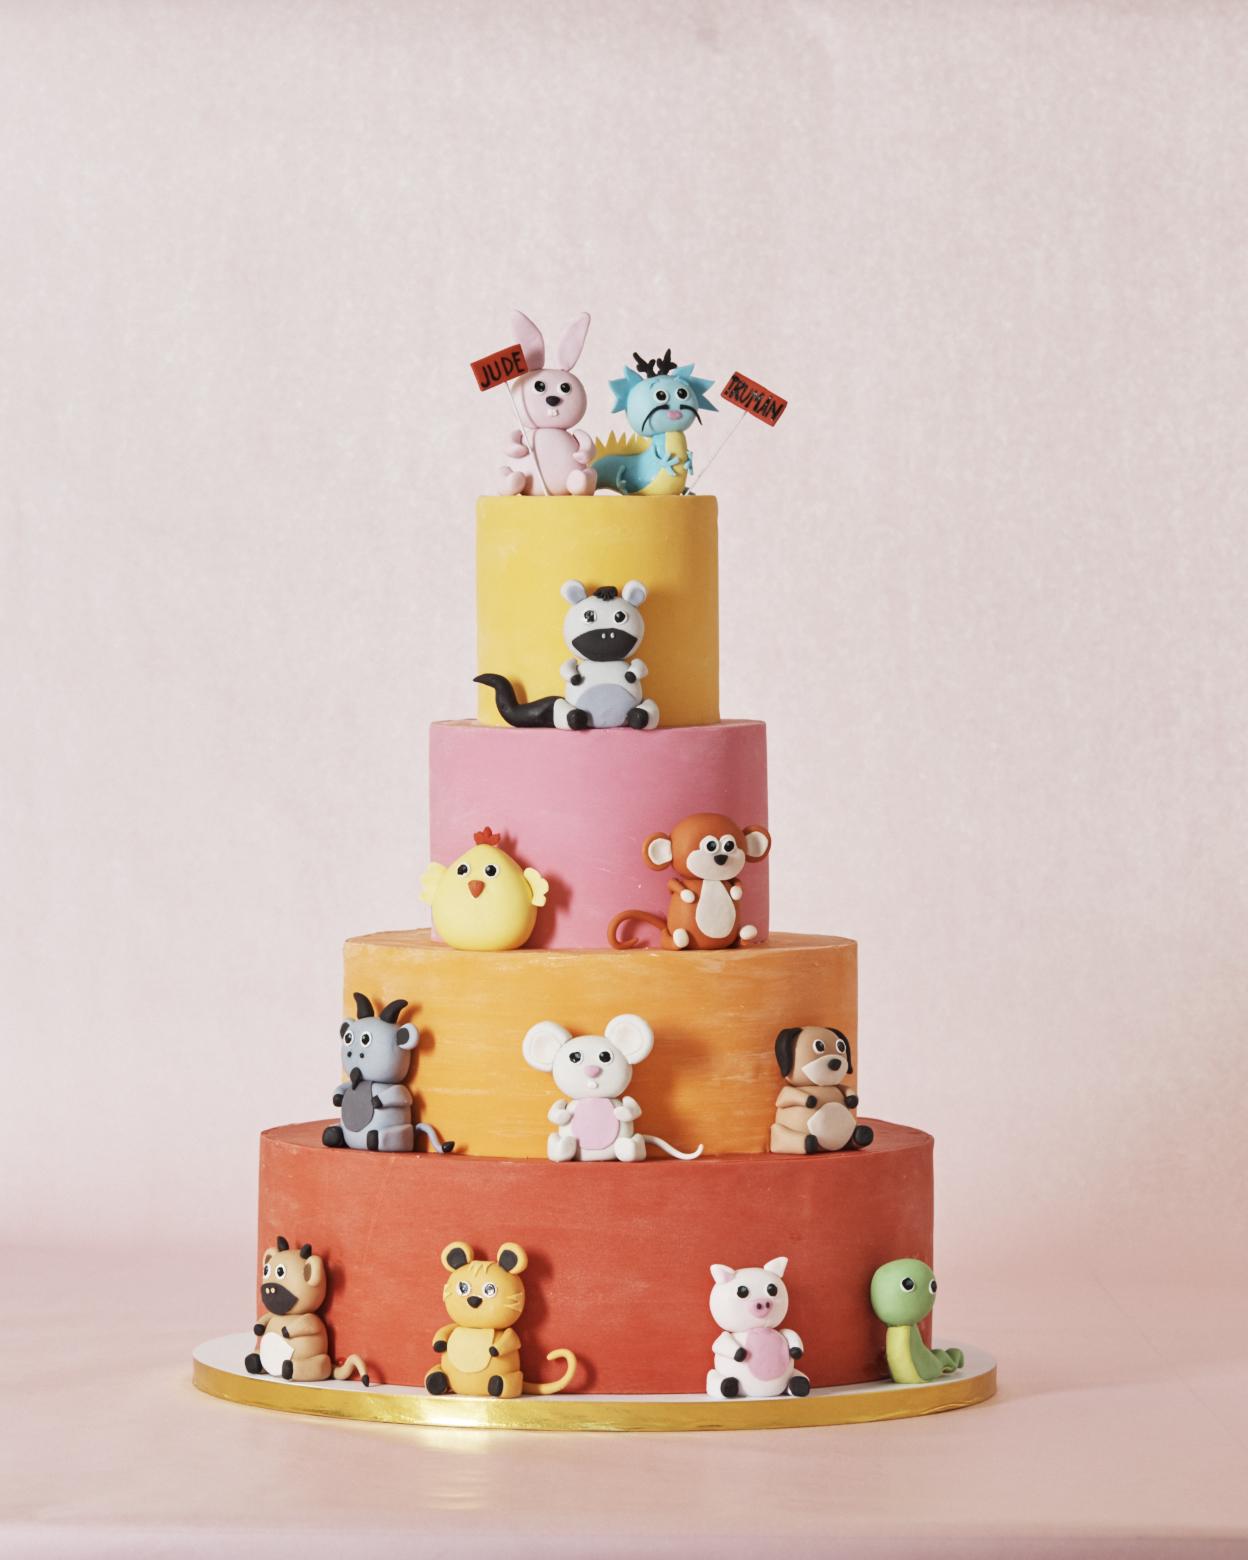 cake-0005-LP-6304870.jpg